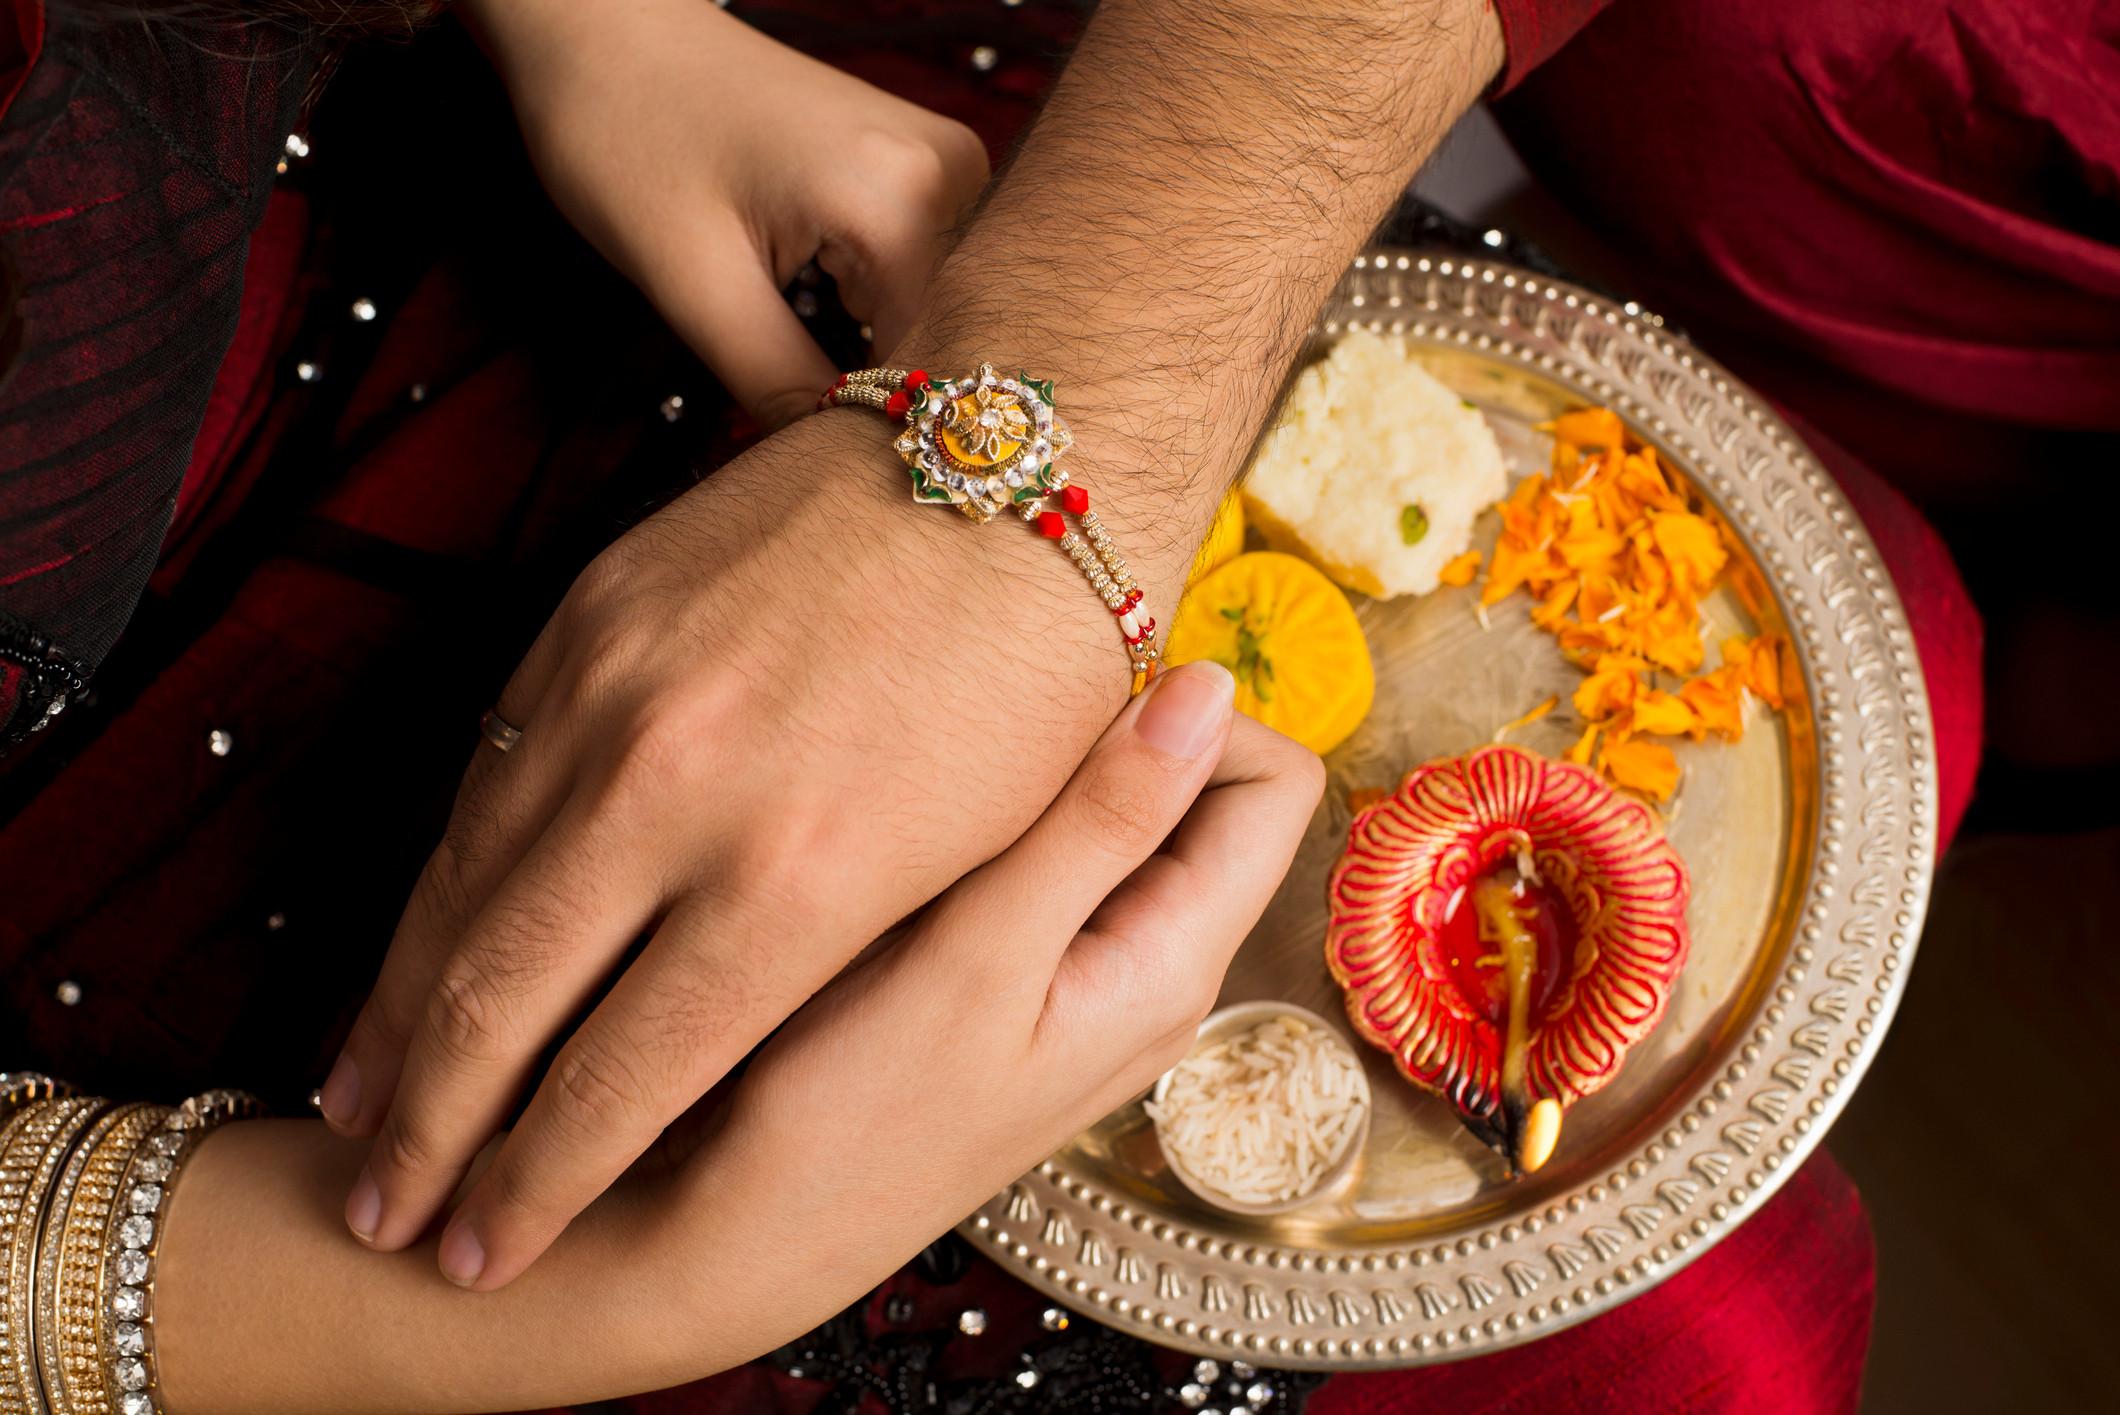 RAKSHA BANDHAN IS A HINDU FESTIVAL